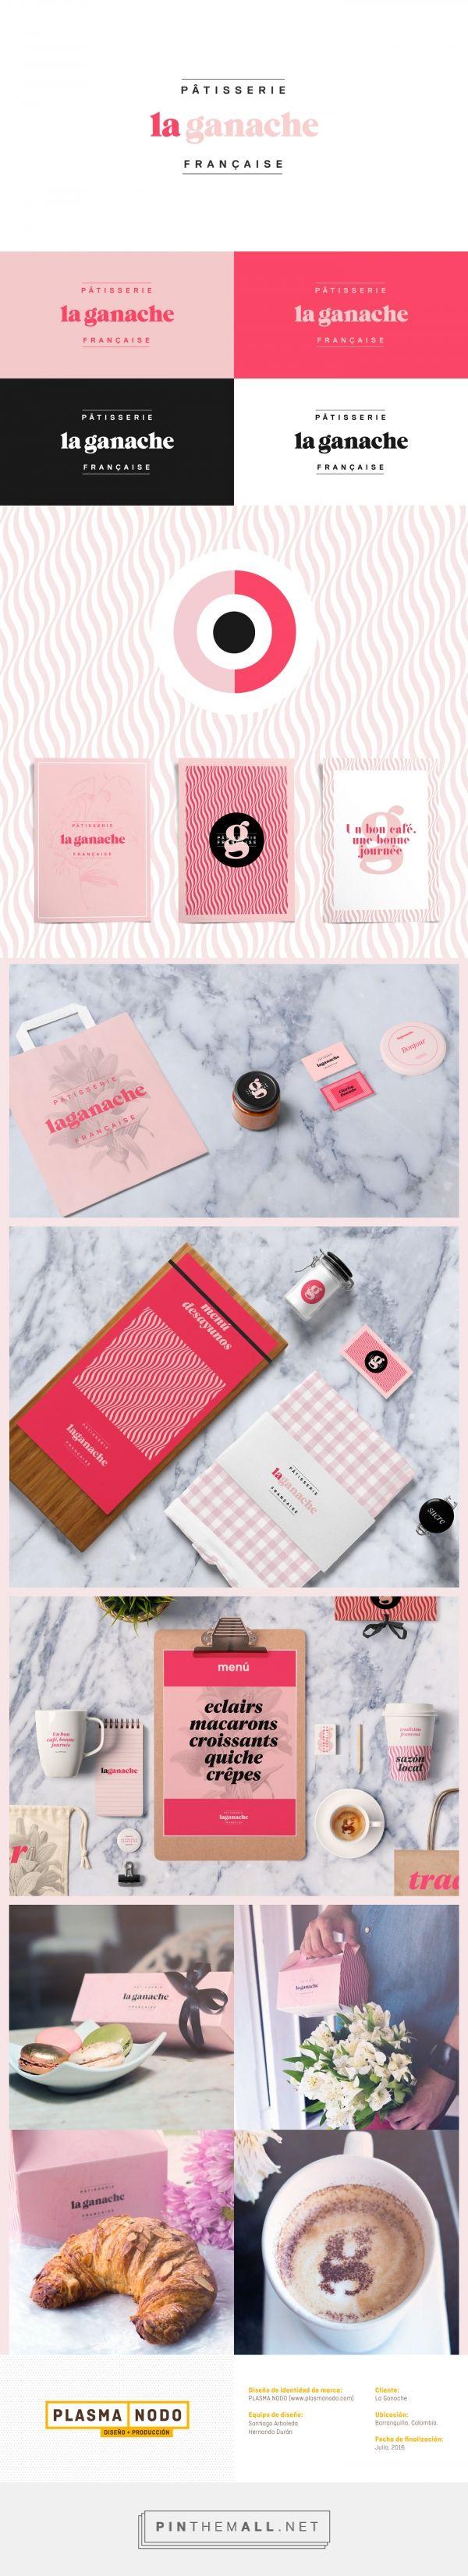 La Ganache Patisserie Branding by Plasma Nodo | Fivestar Branding Agency – Design and Branding Agency & Curated Inspiration Gallery